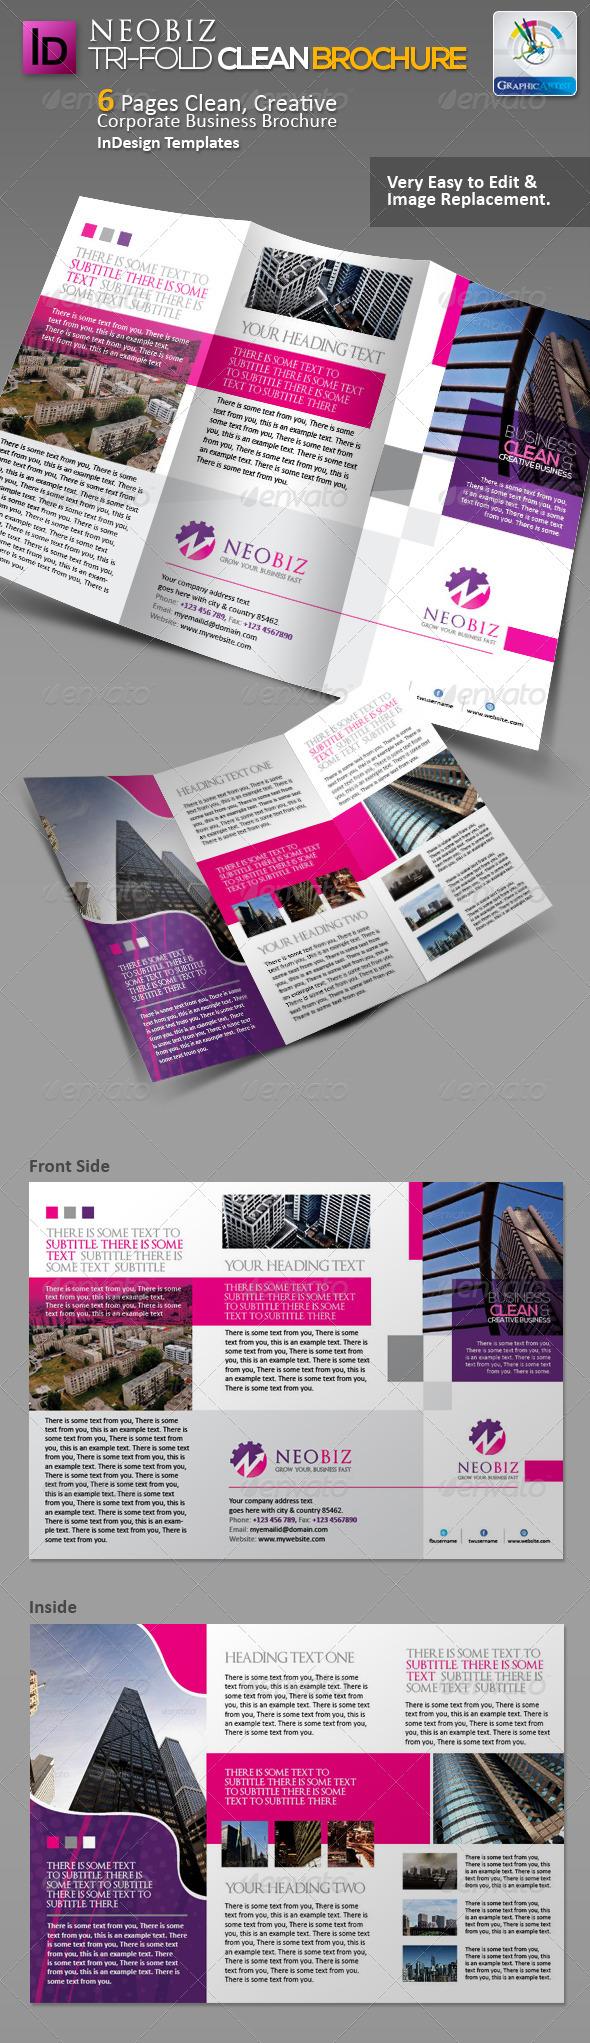 NeoBiz Tri-fold Clean Brochure - Corporate Brochures